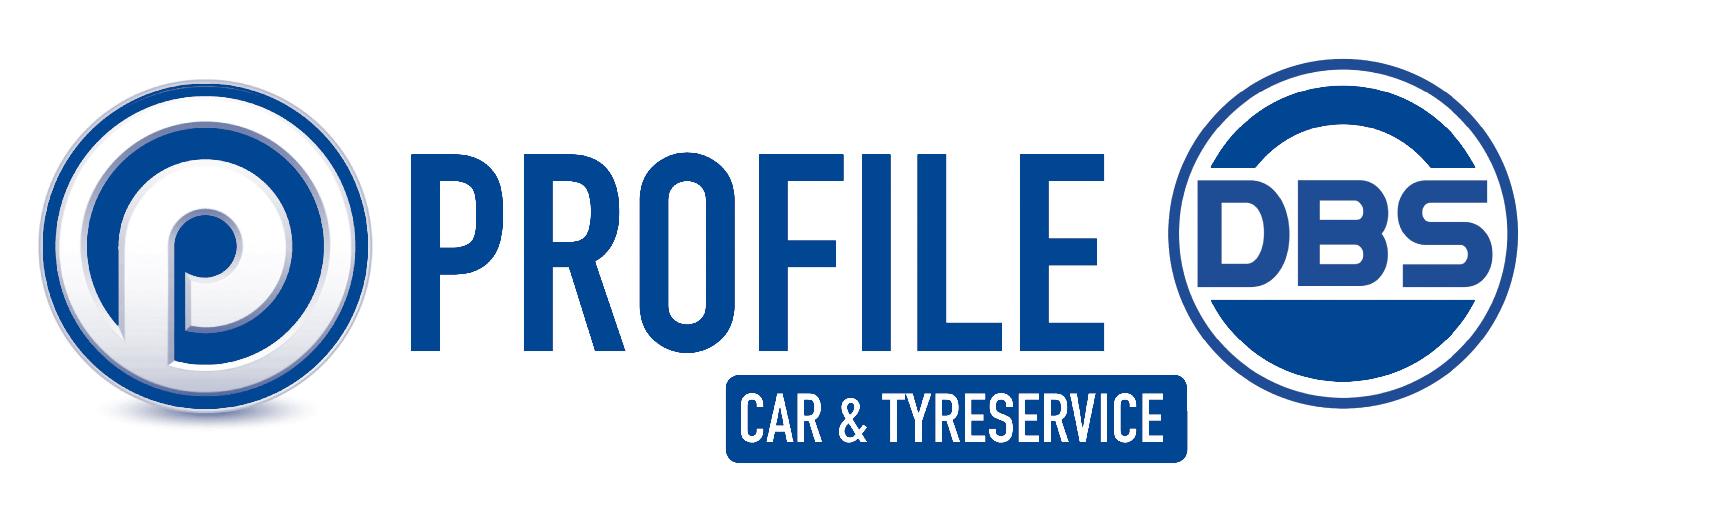 Profile Car&Tyreservice DBS Logo